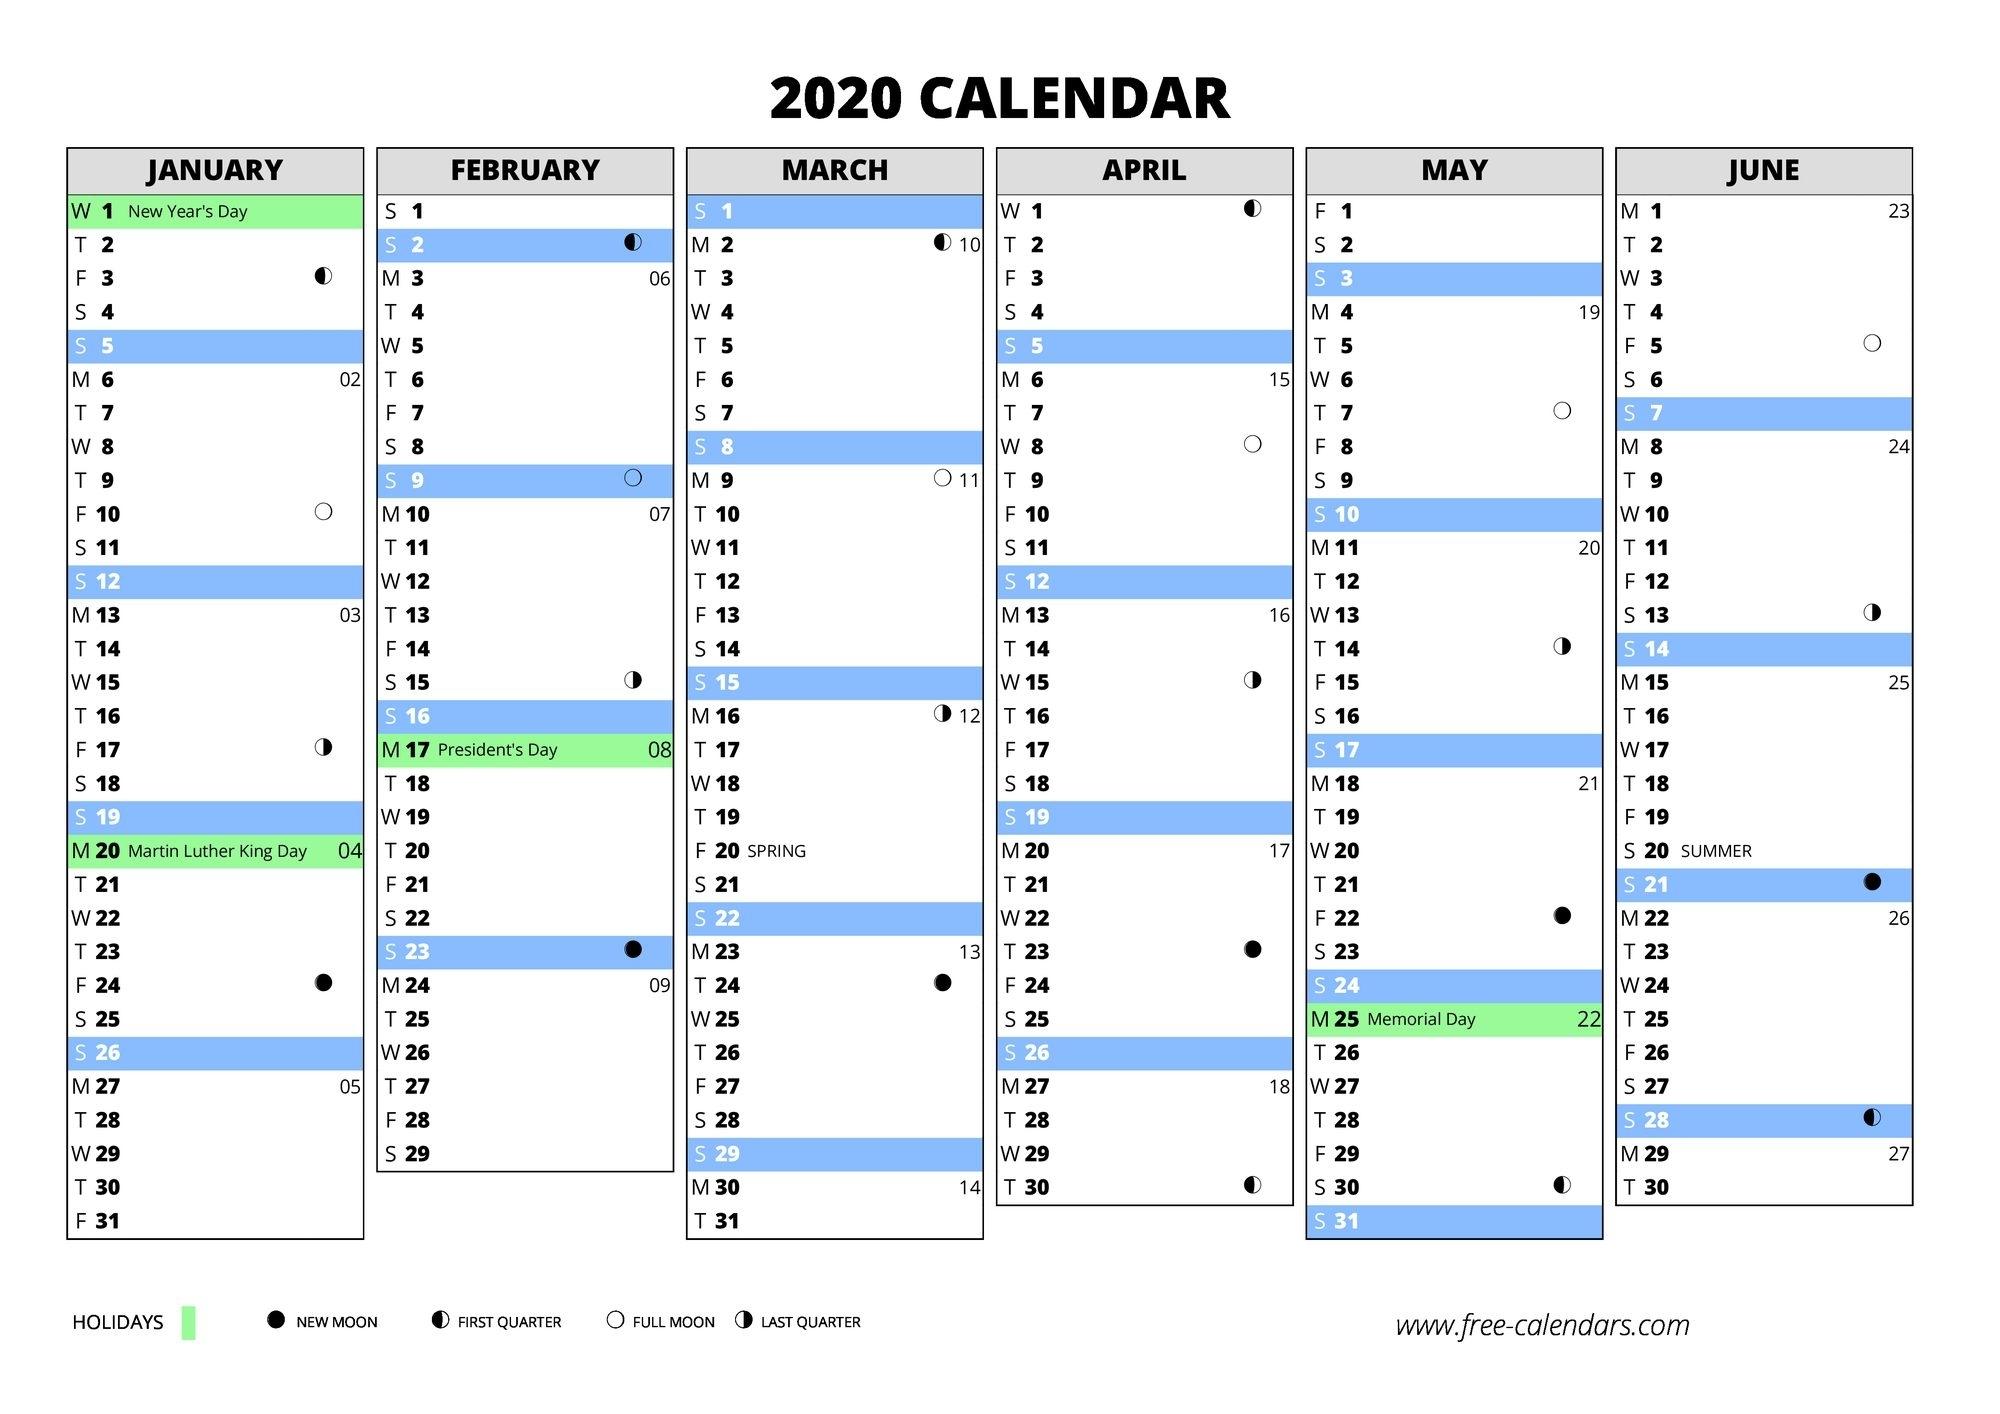 2020 Calendar ≡ Free-Calendars for 2020 Calendar With Week Numbers In Excel